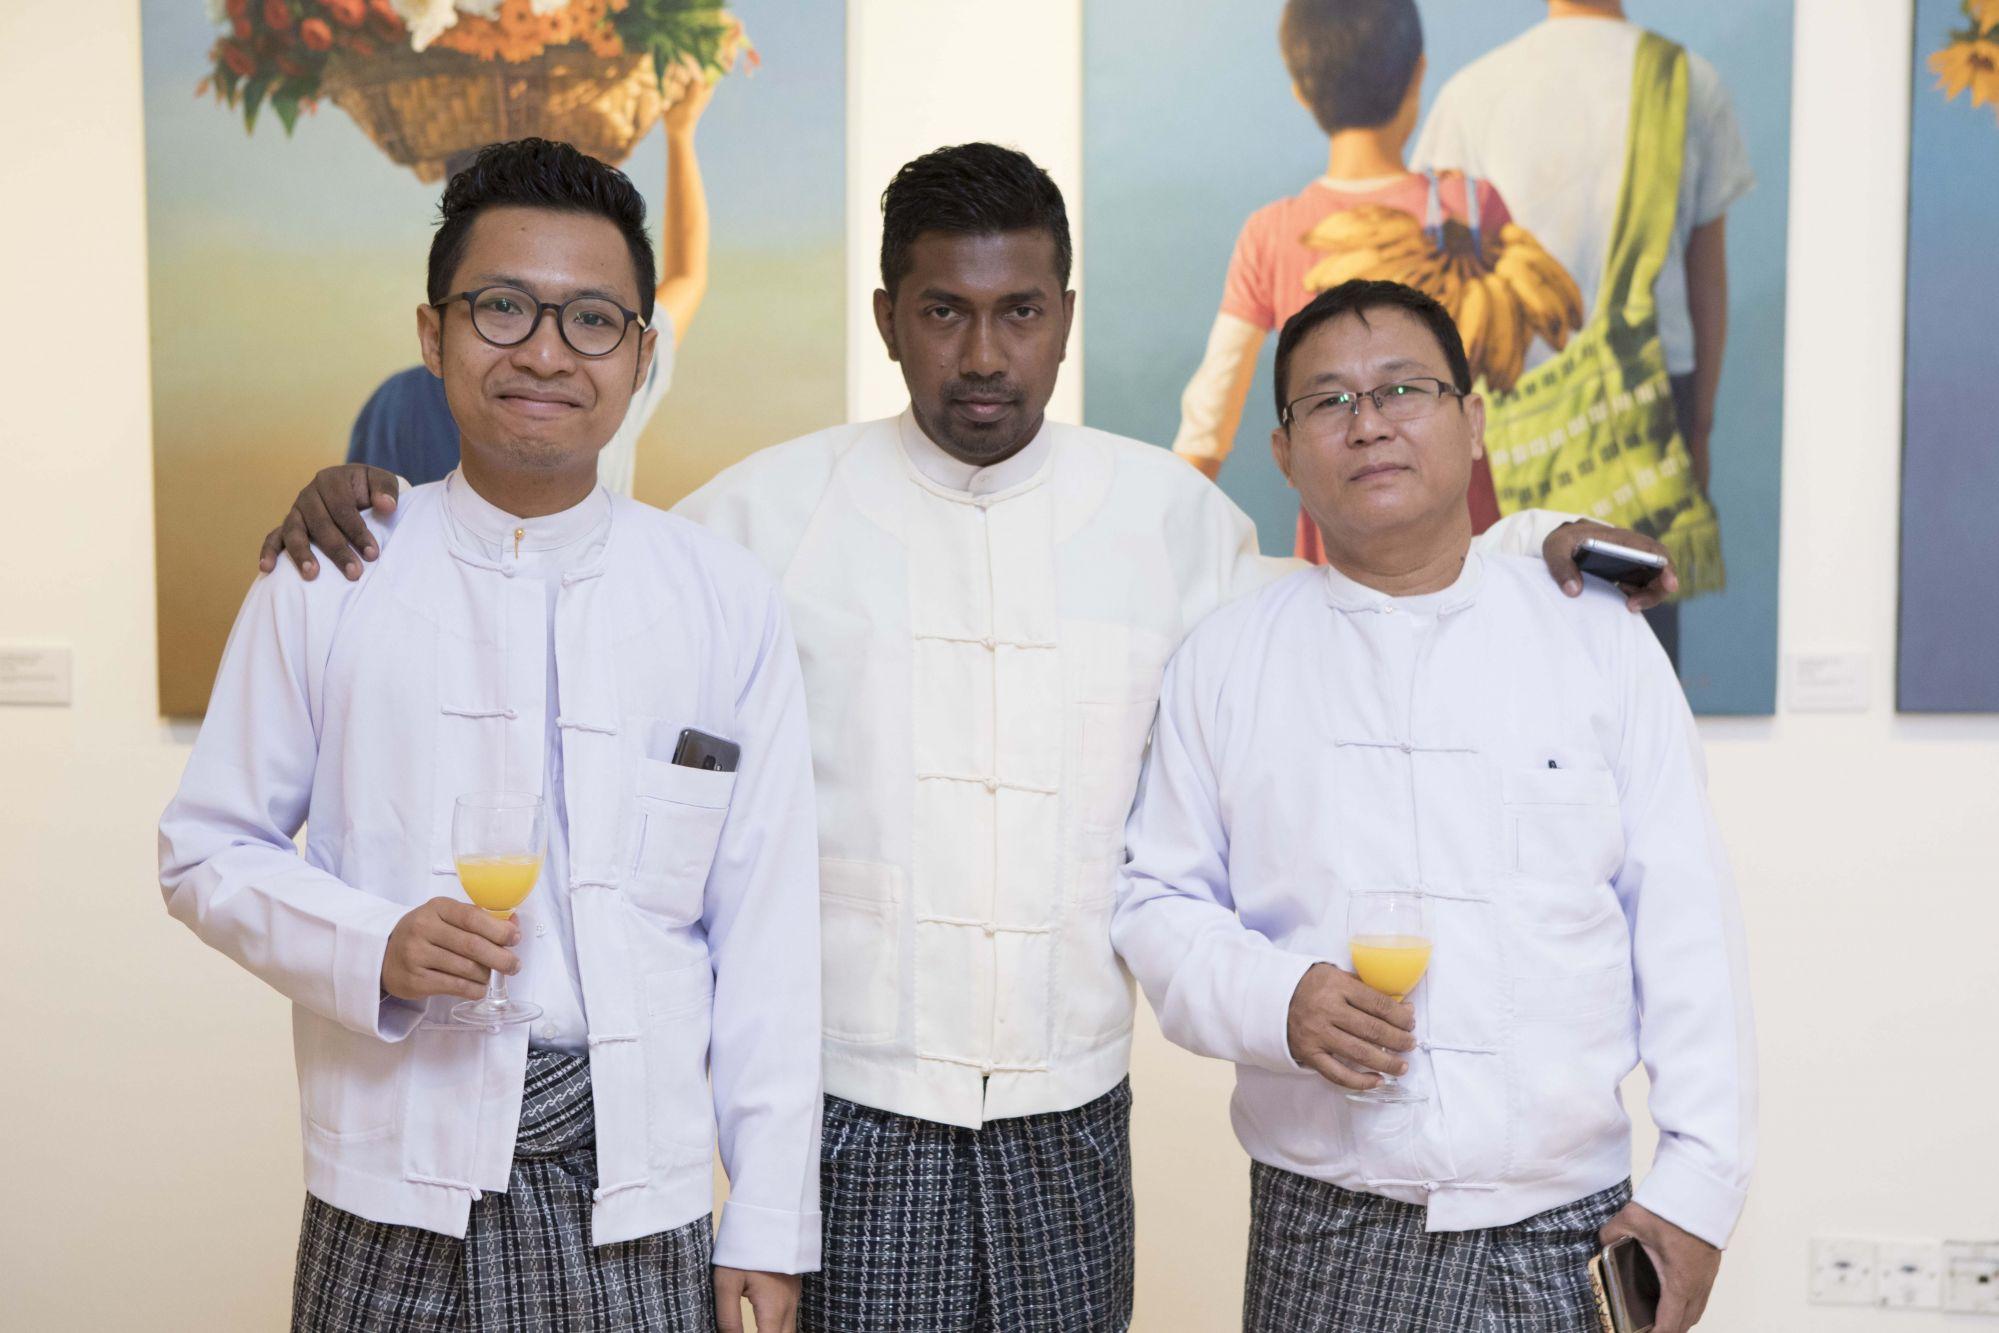 Ngwe Phyoe, Zin Min, Ngwe Aung